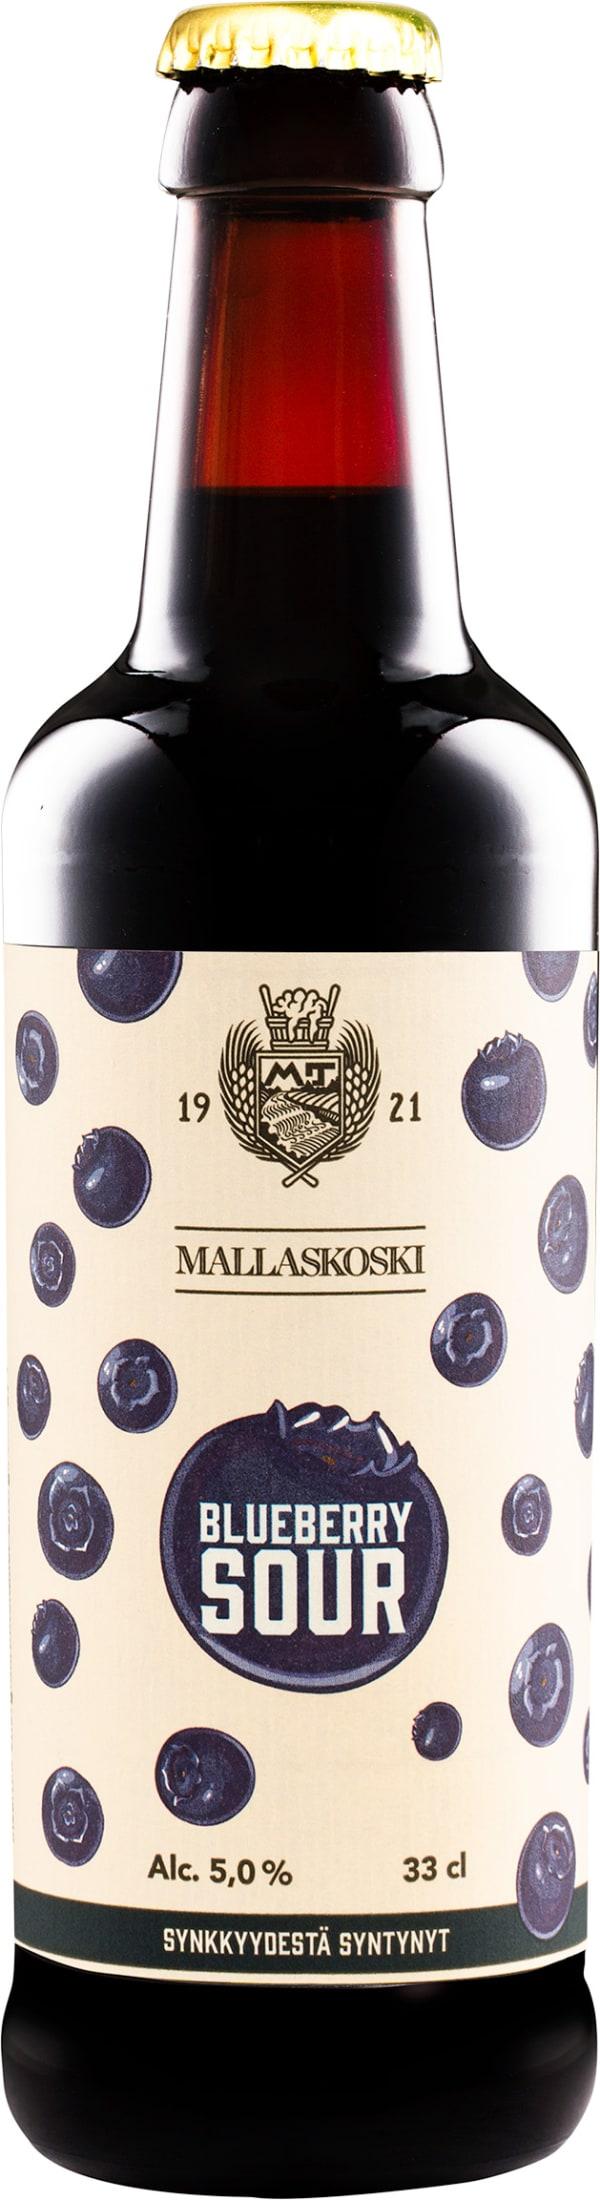 Mallaskoski Blueberry Sour Ale